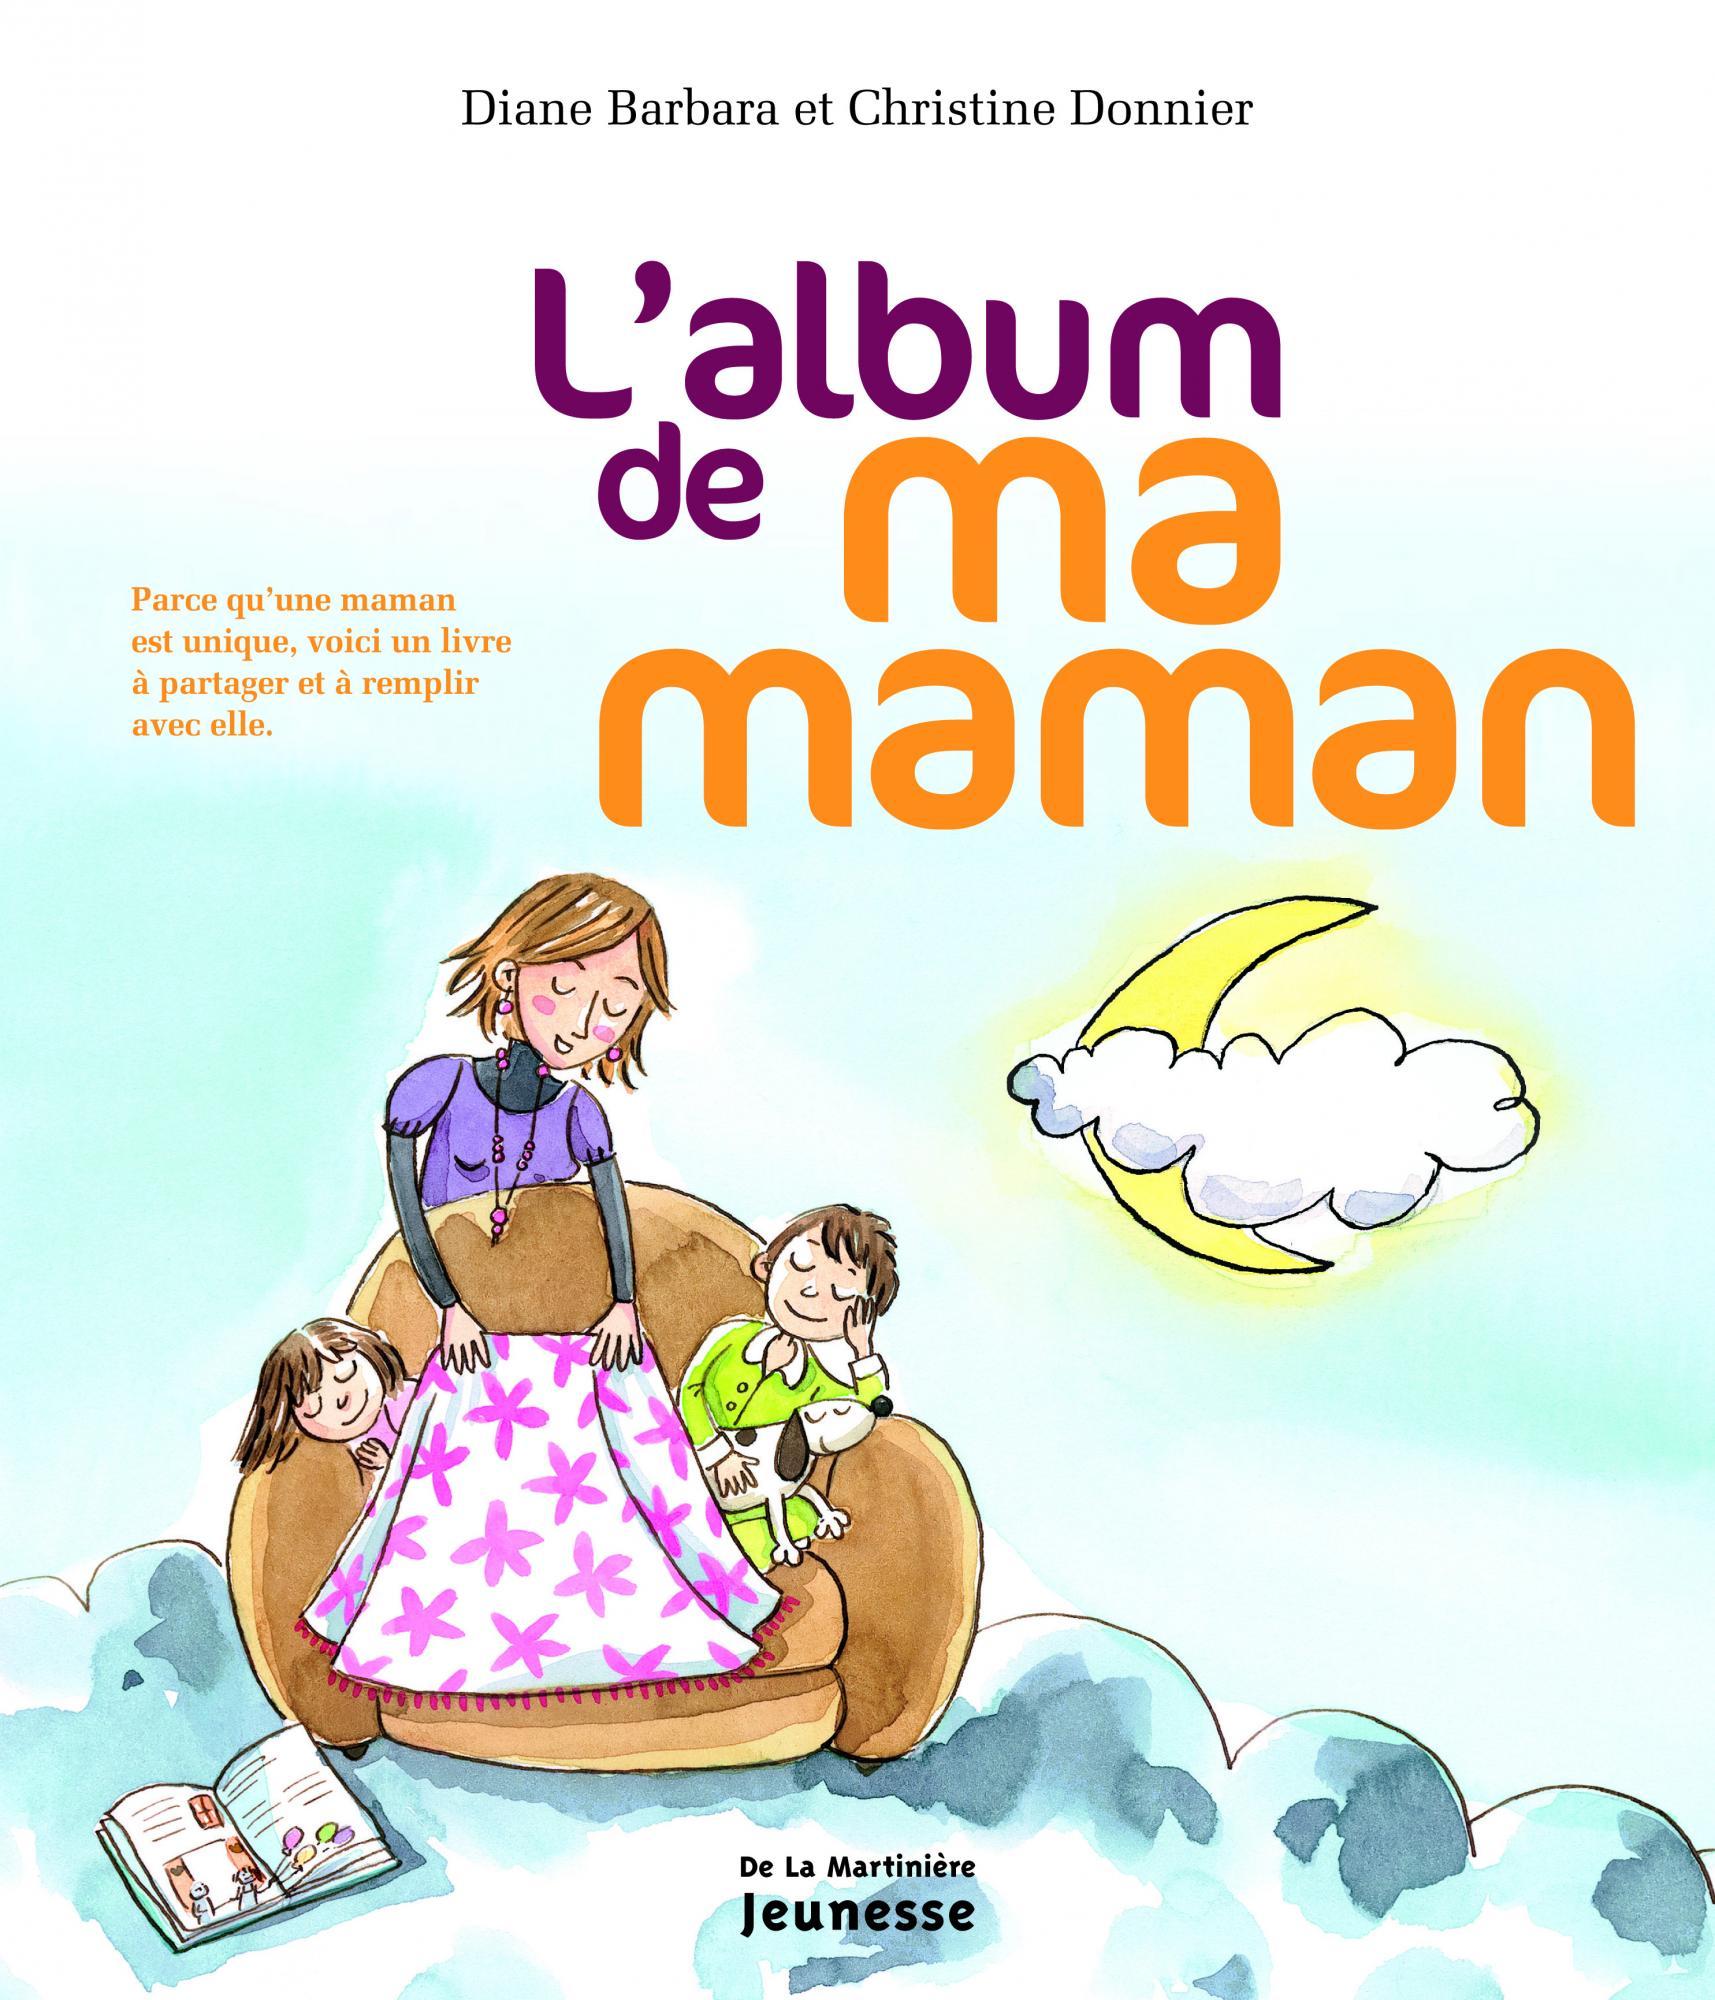 Exceptionnel L'Album de ma maman - Diane Barbara | Editions de La Martinière  BT43